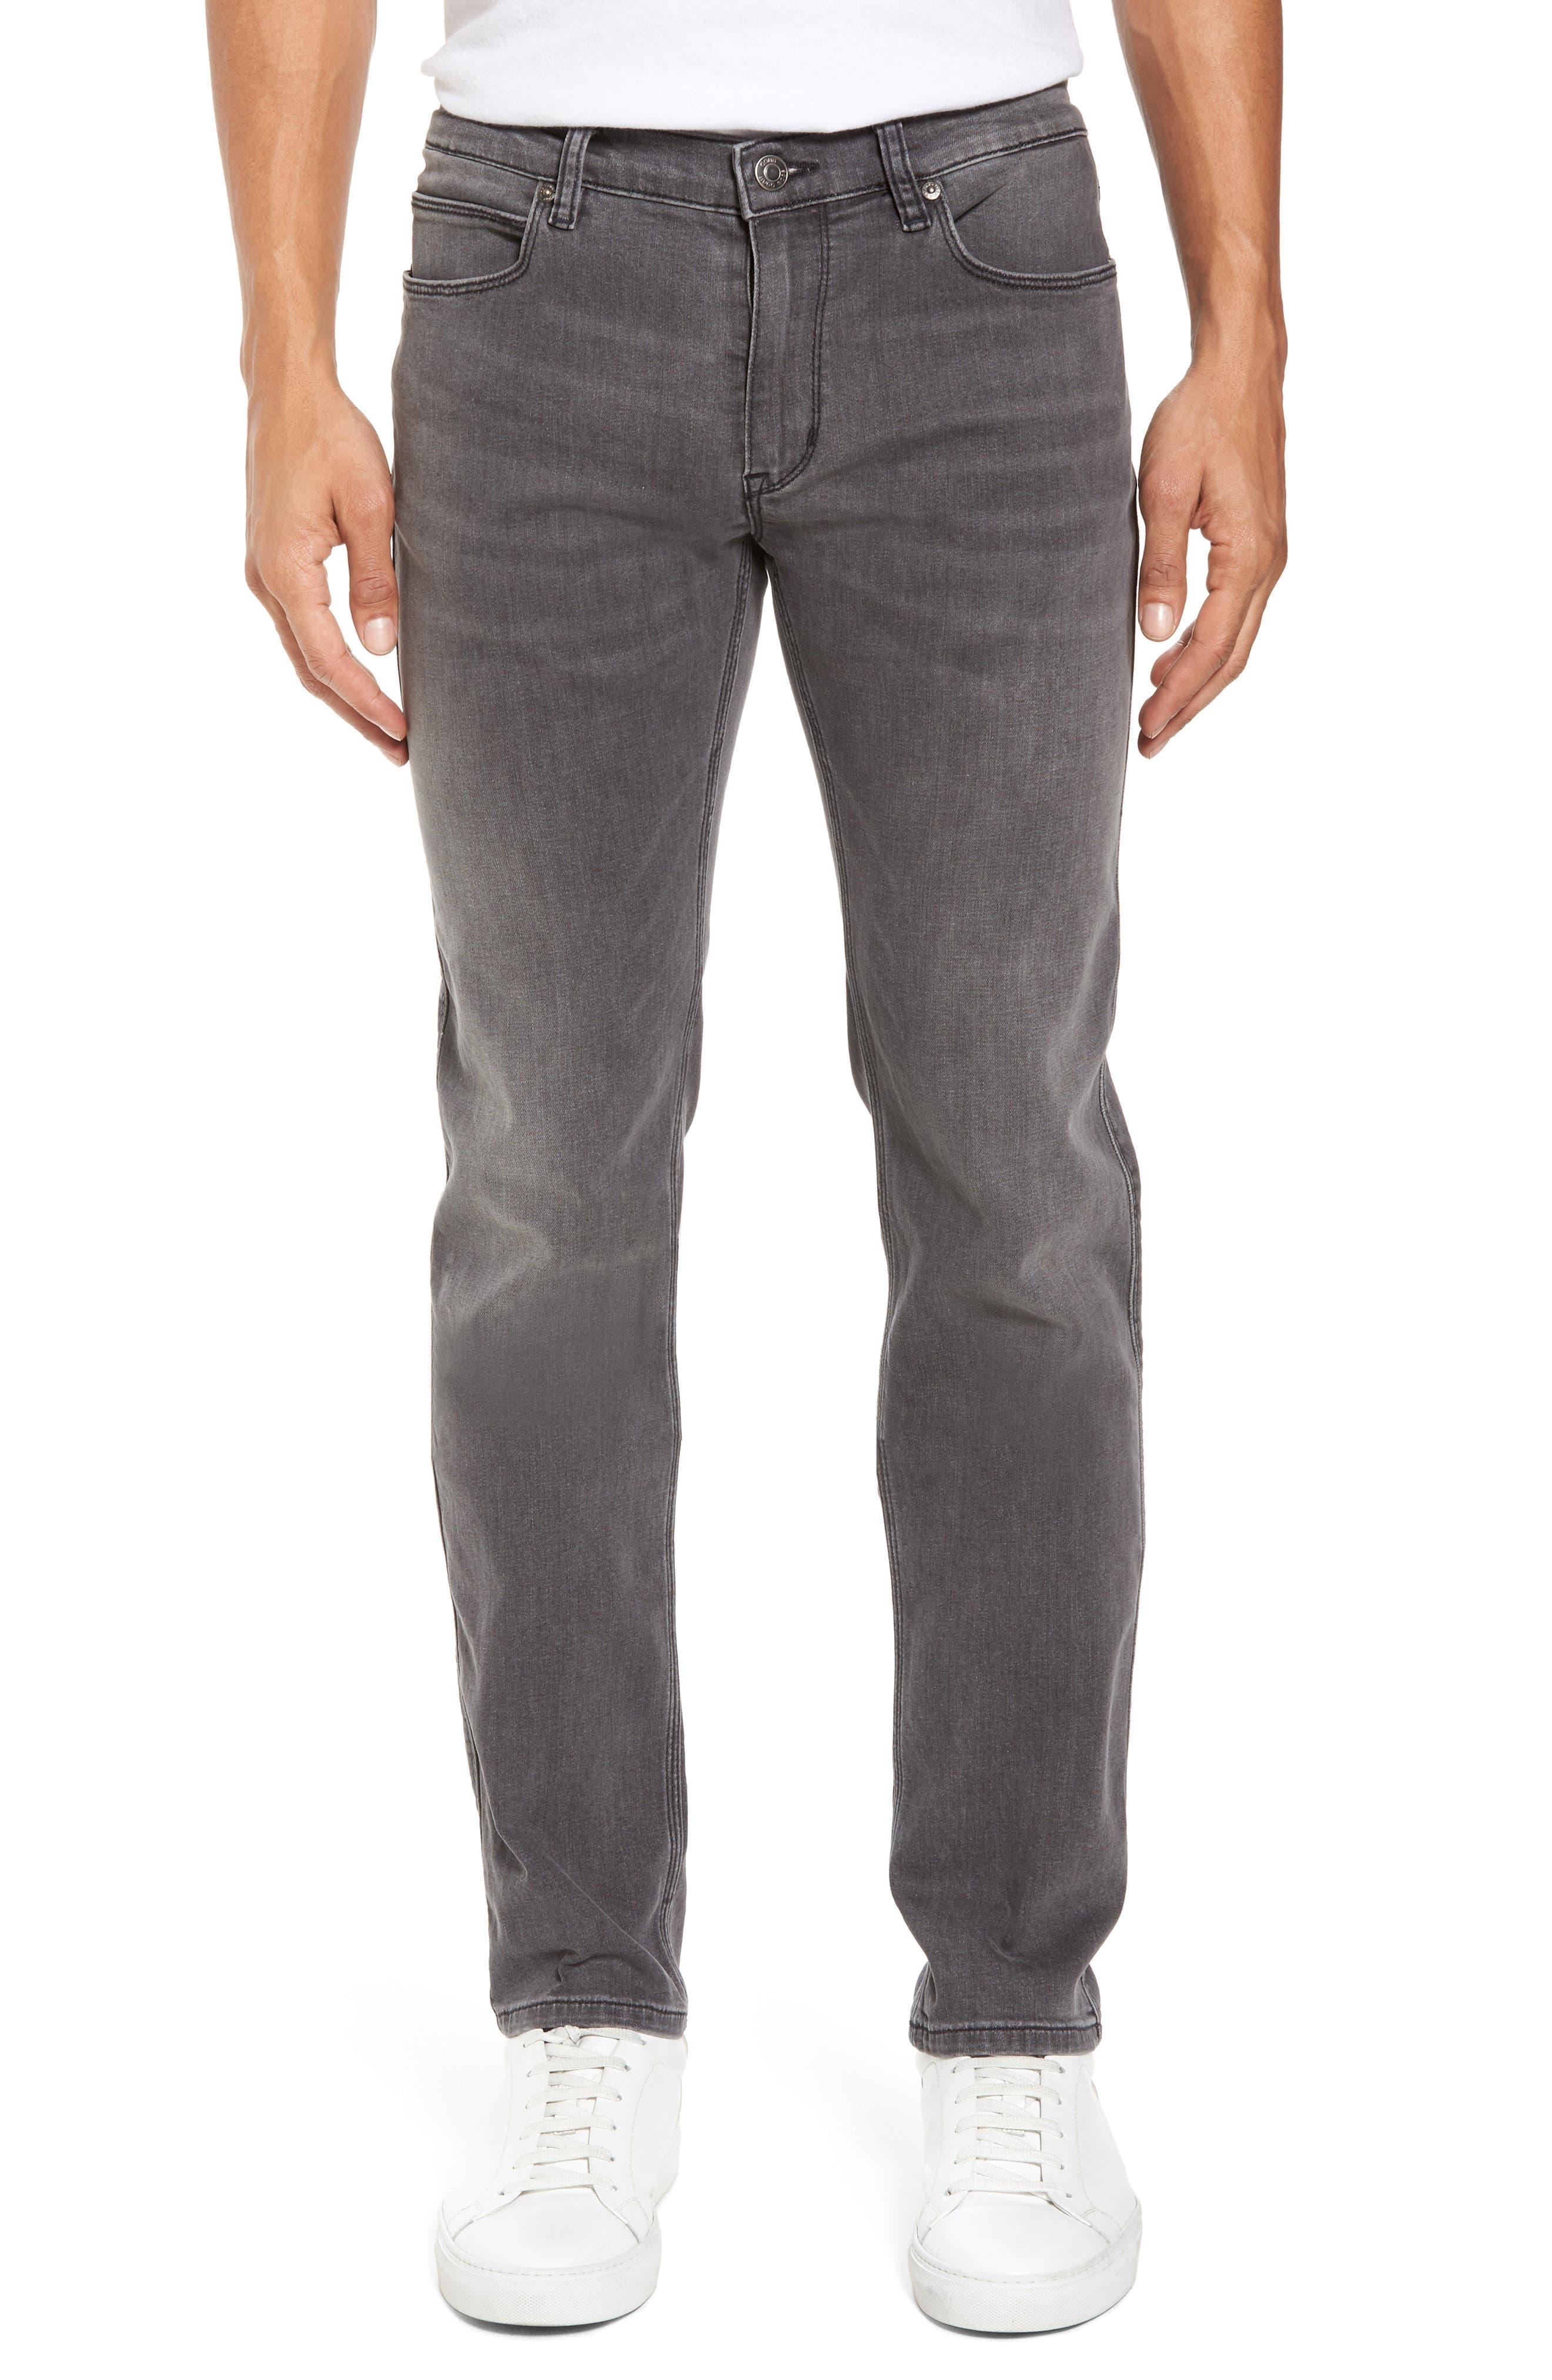 Hugo Boss 708 Stonewash Denim Jeans,                             Main thumbnail 1, color,                             021